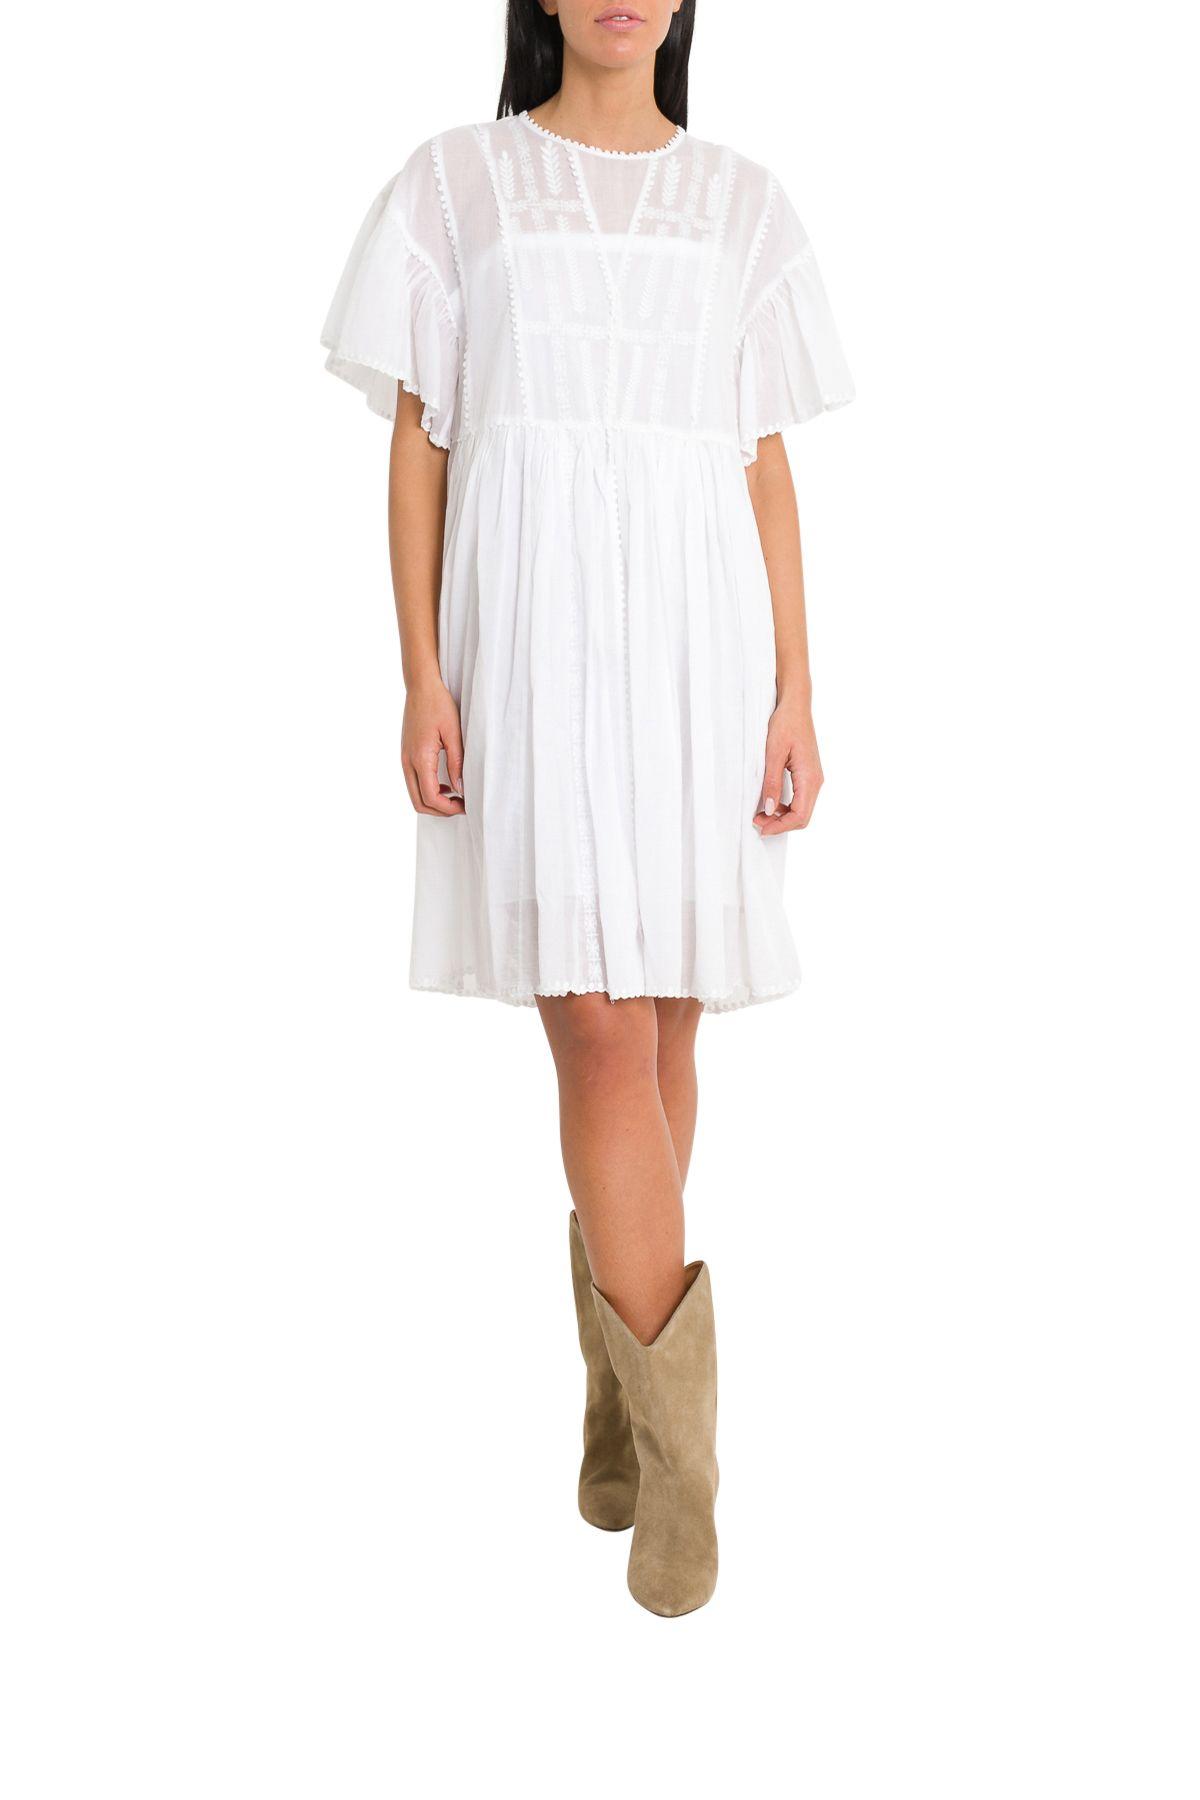 f6a4db1e282 Isabel Marant Étoile Isabel Marant Étoile Amelie Dress - Bianco ...